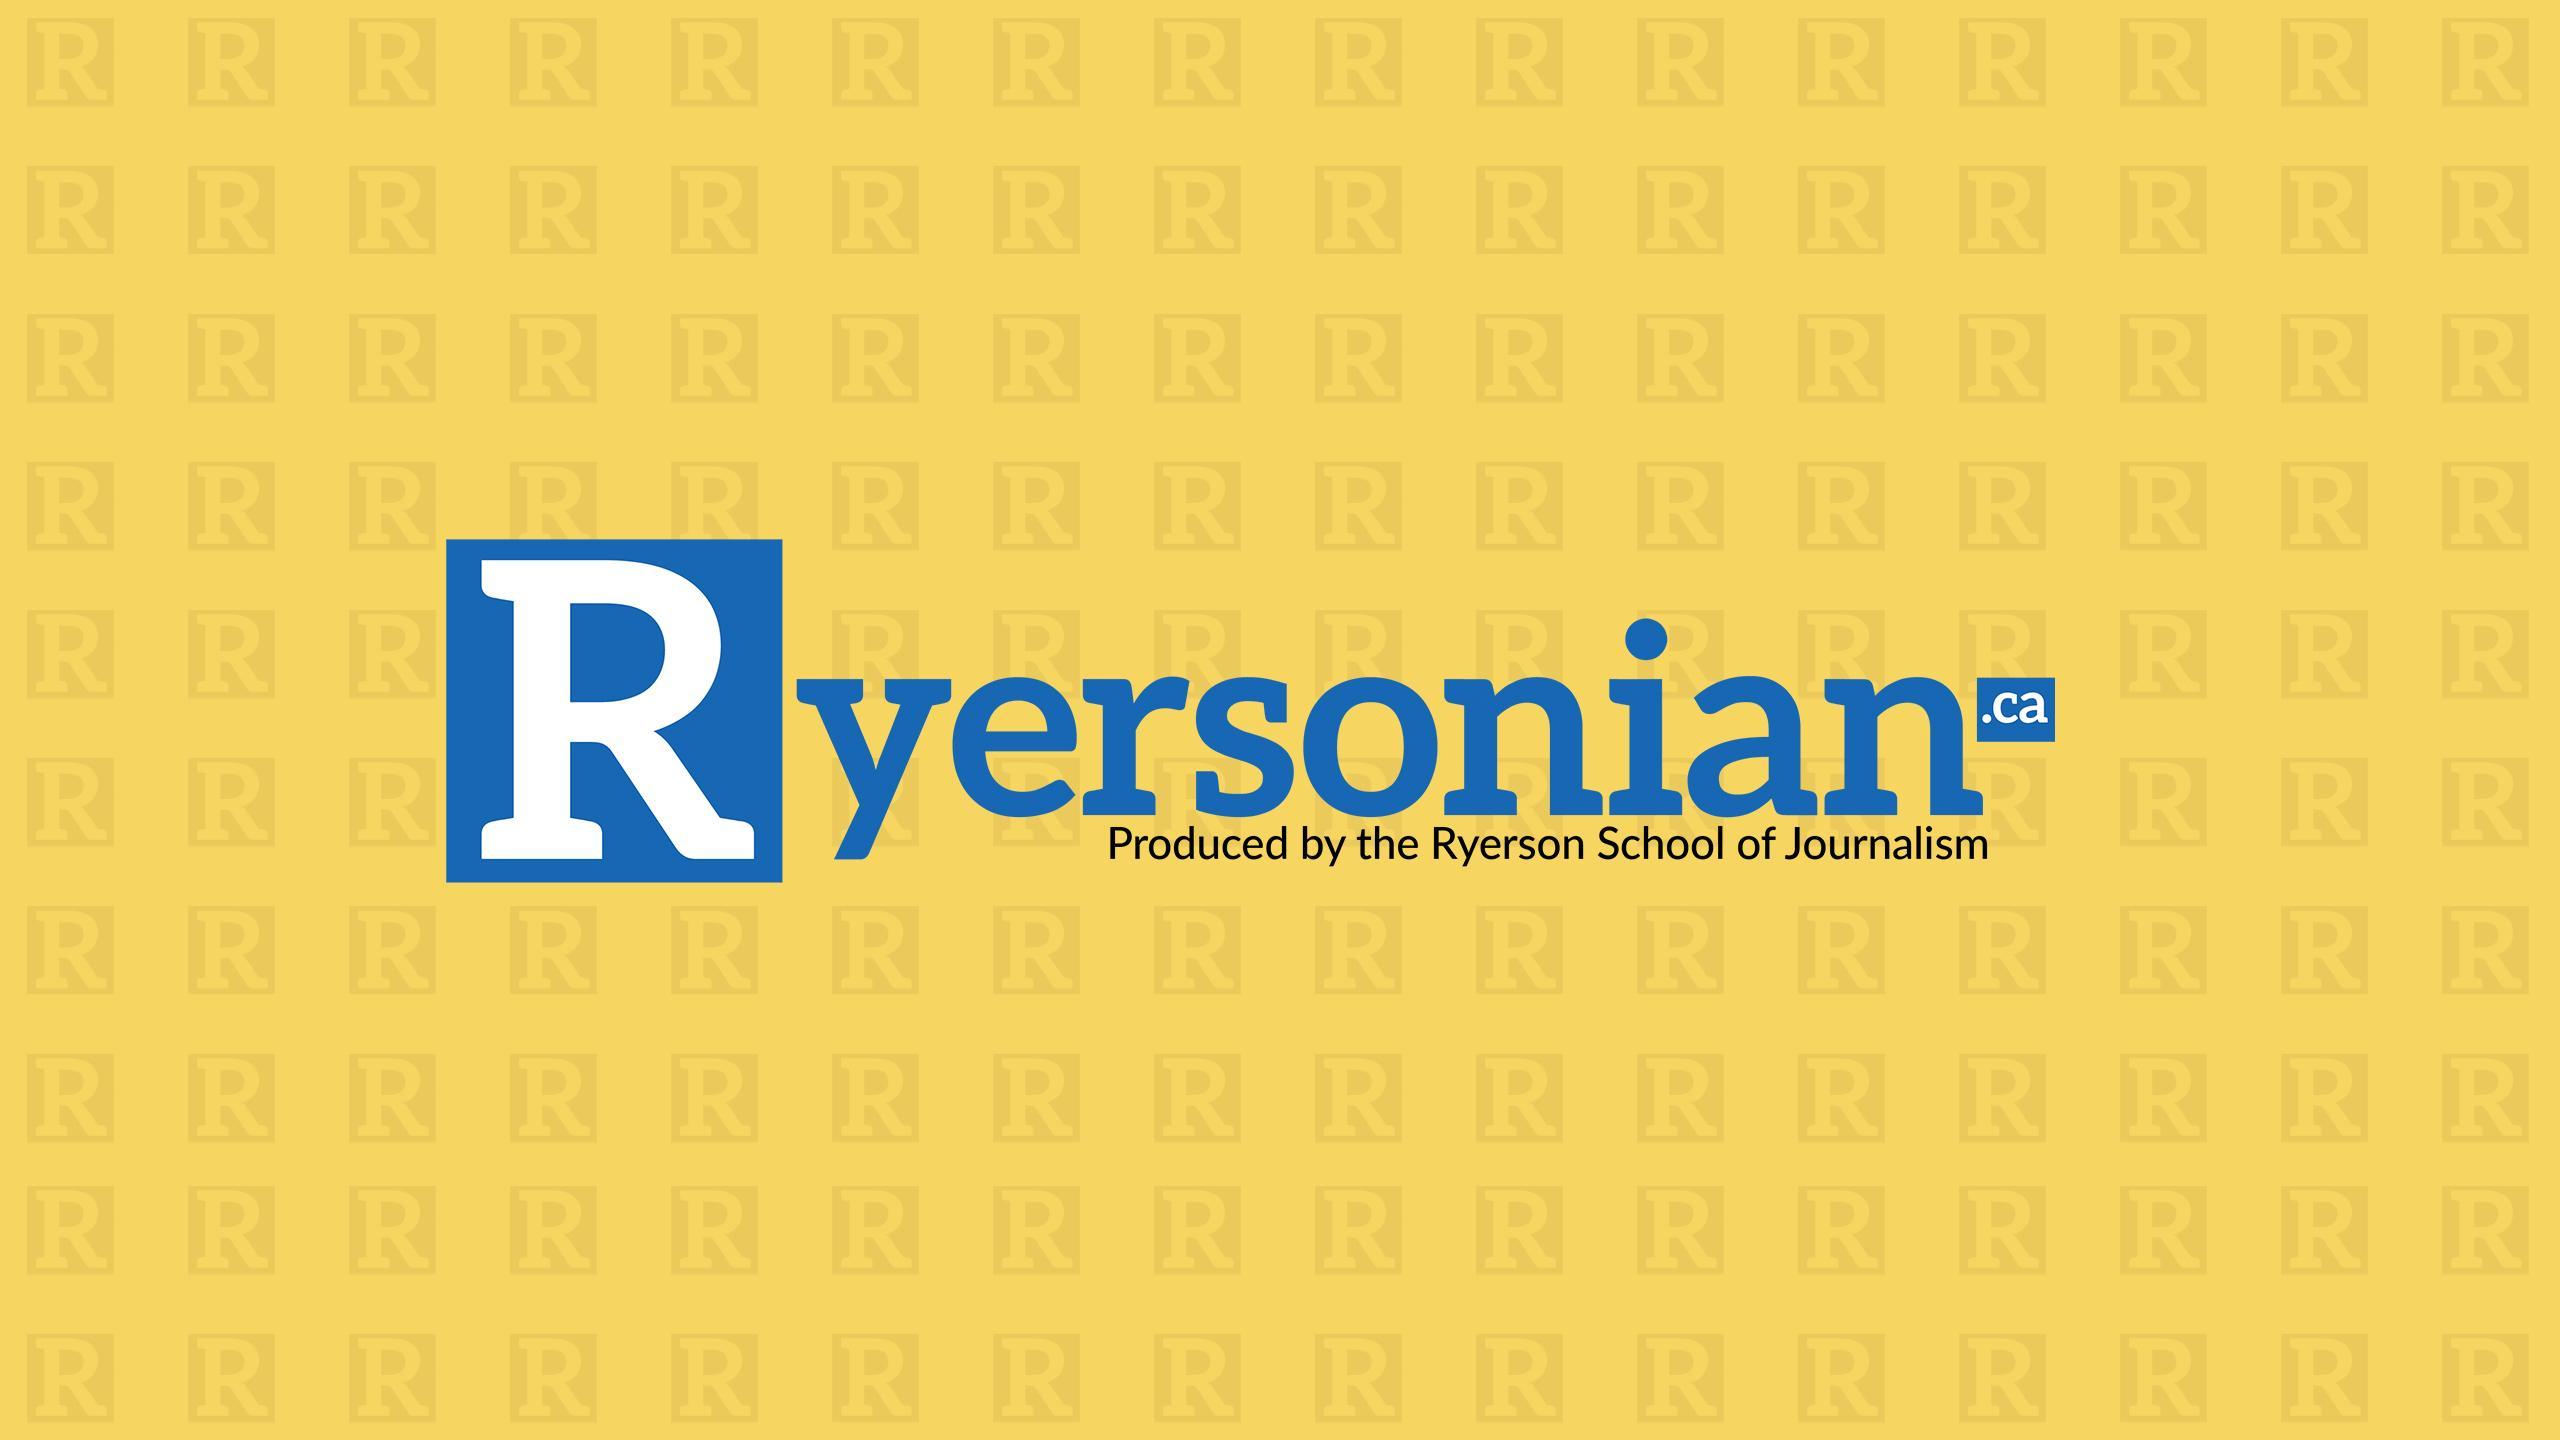 Ryersonian Newspaper Logo